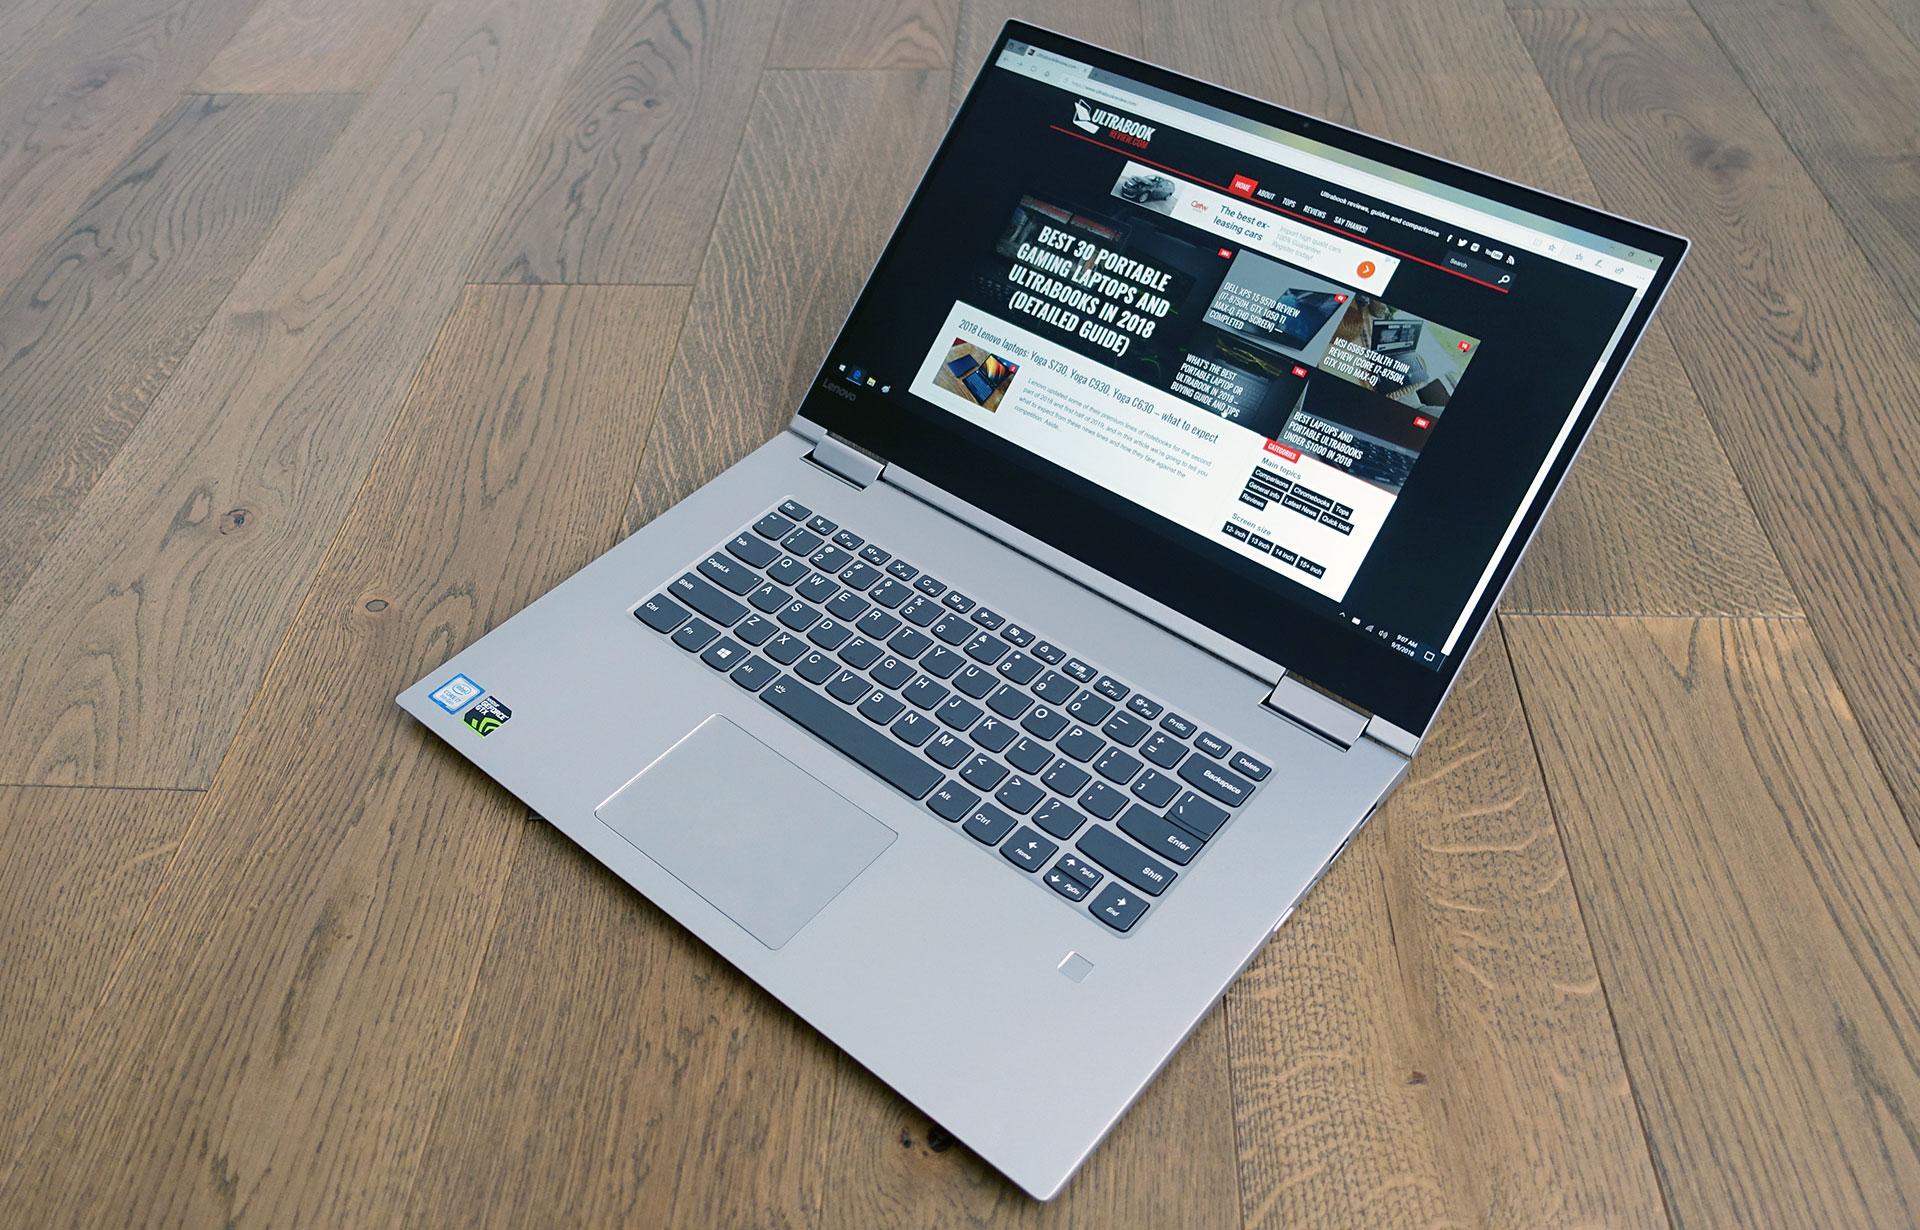 Lenovo Yoga 730 15 review (Yoga 730-15IKB model - i7-8550U, GTX 1050